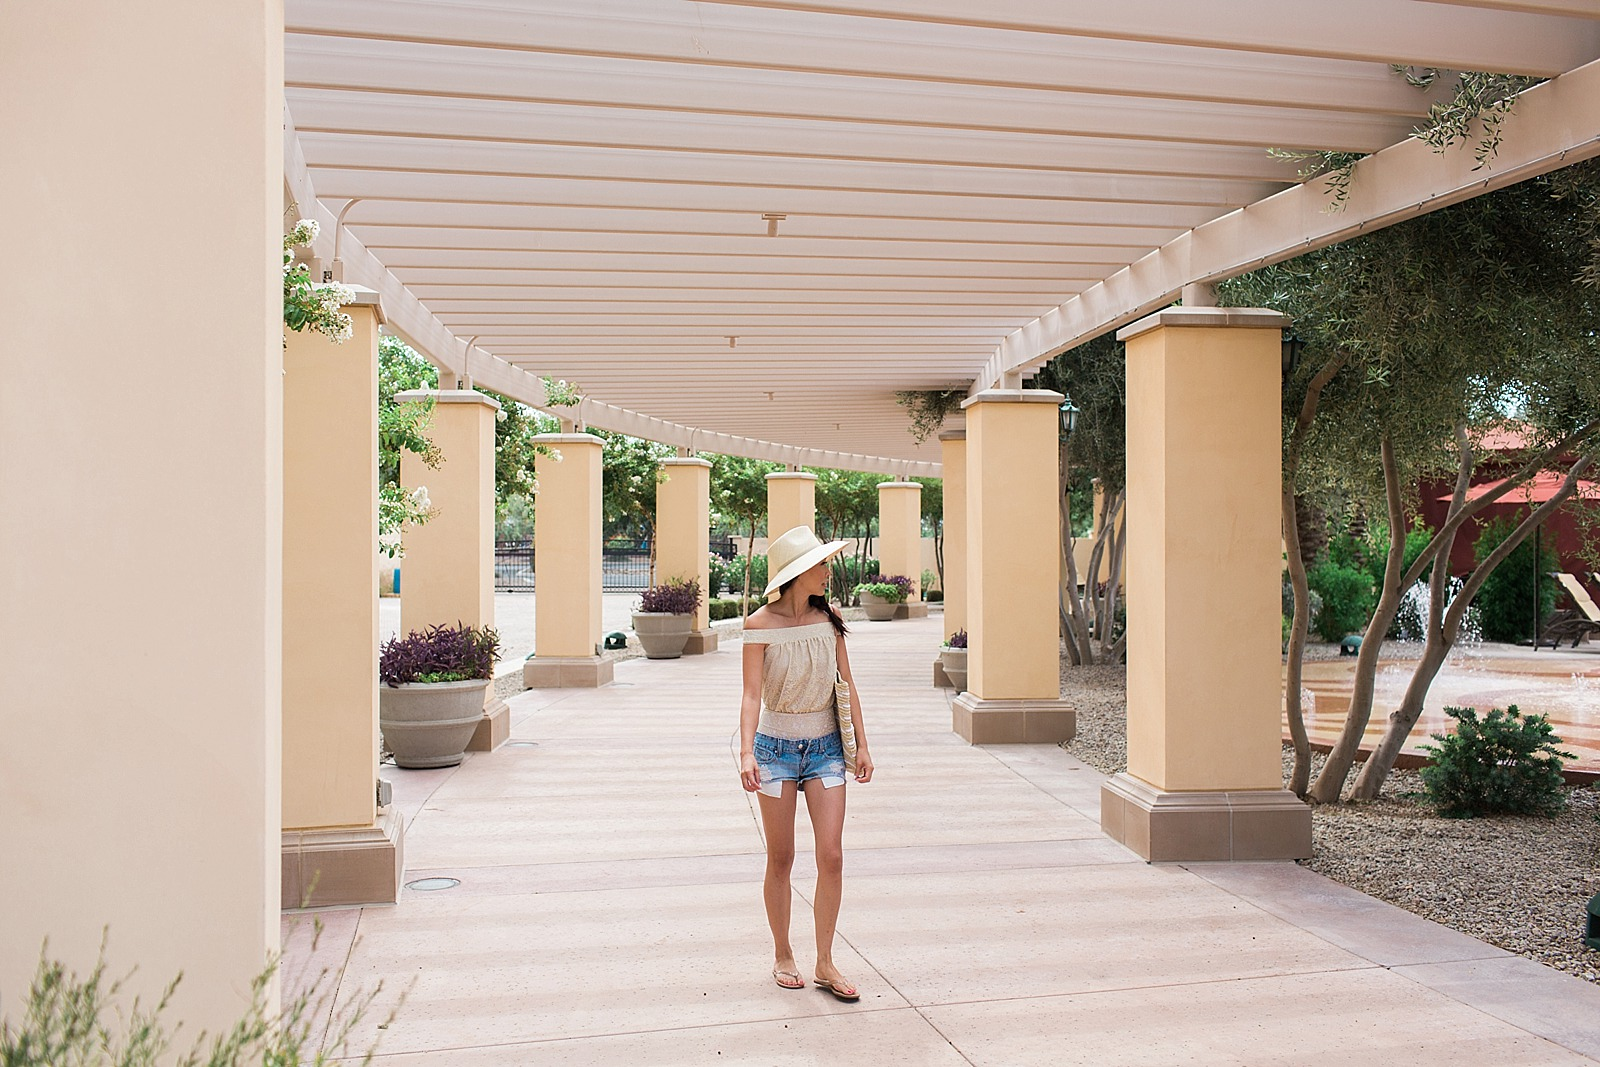 casino-del-sol-hotel-tucson-review-stay-diana-elizabeth-blog_0008